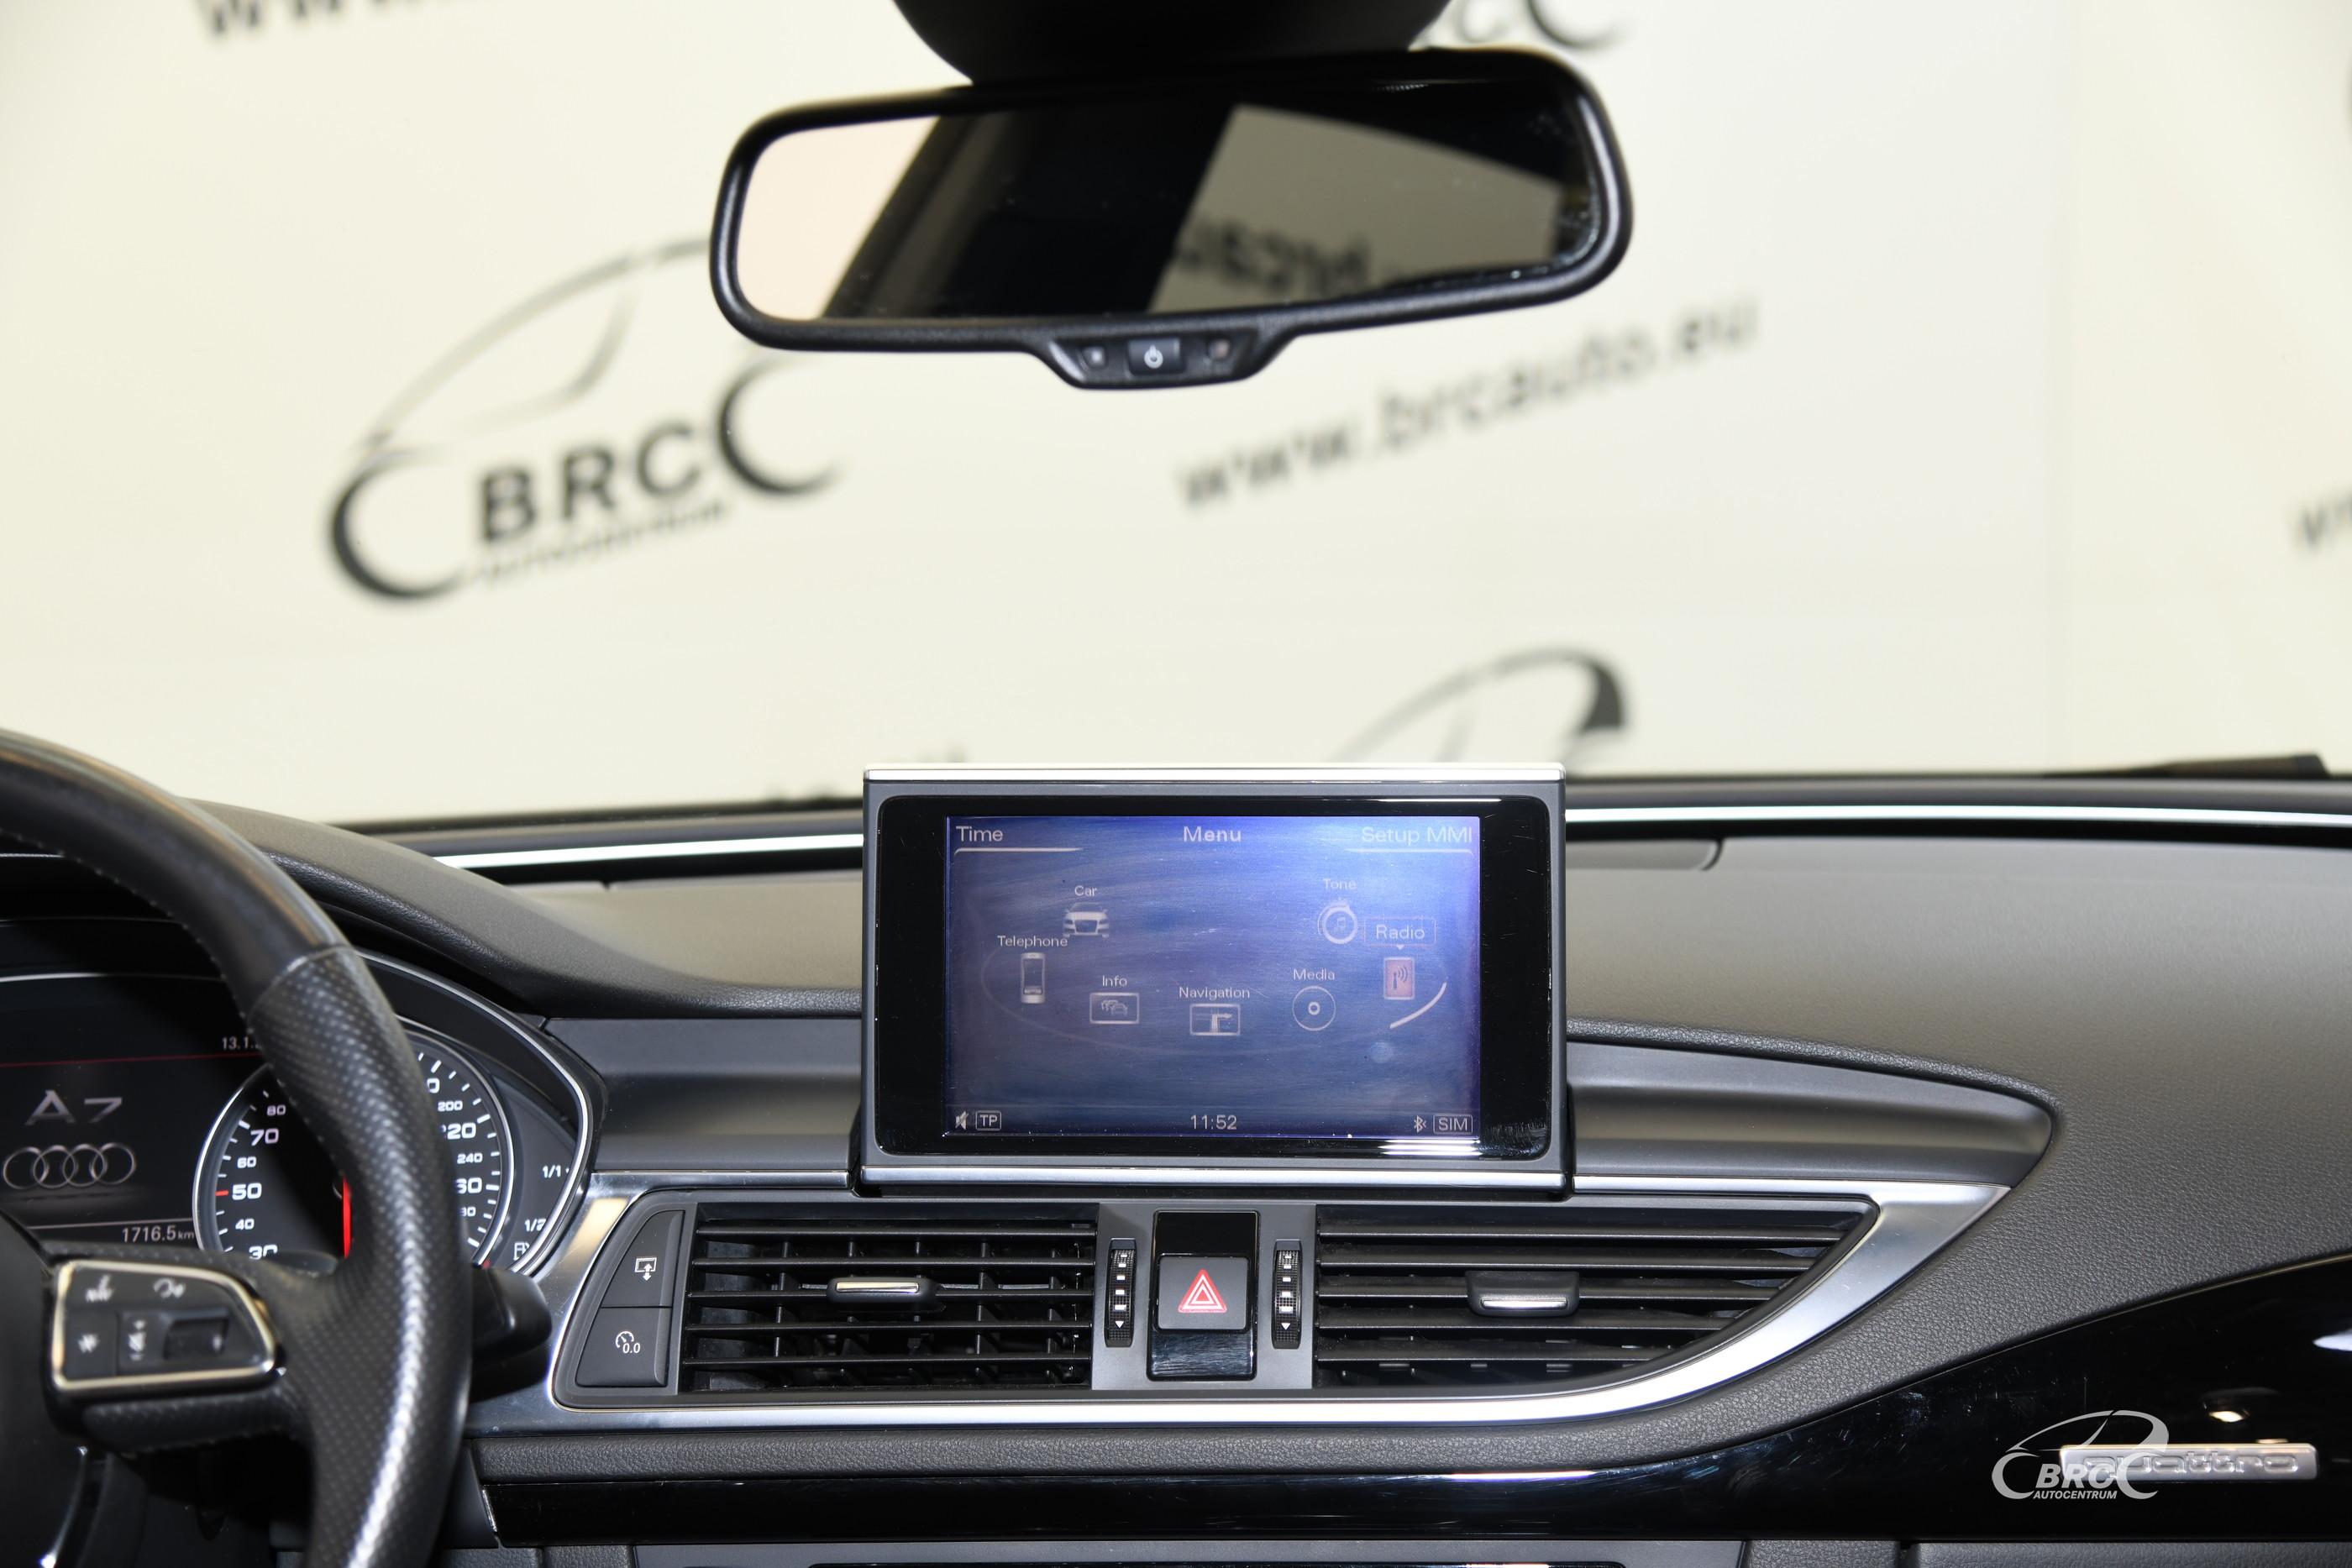 Audi A7 Sportback 3.0 TDI S-Line Quattro Automatas